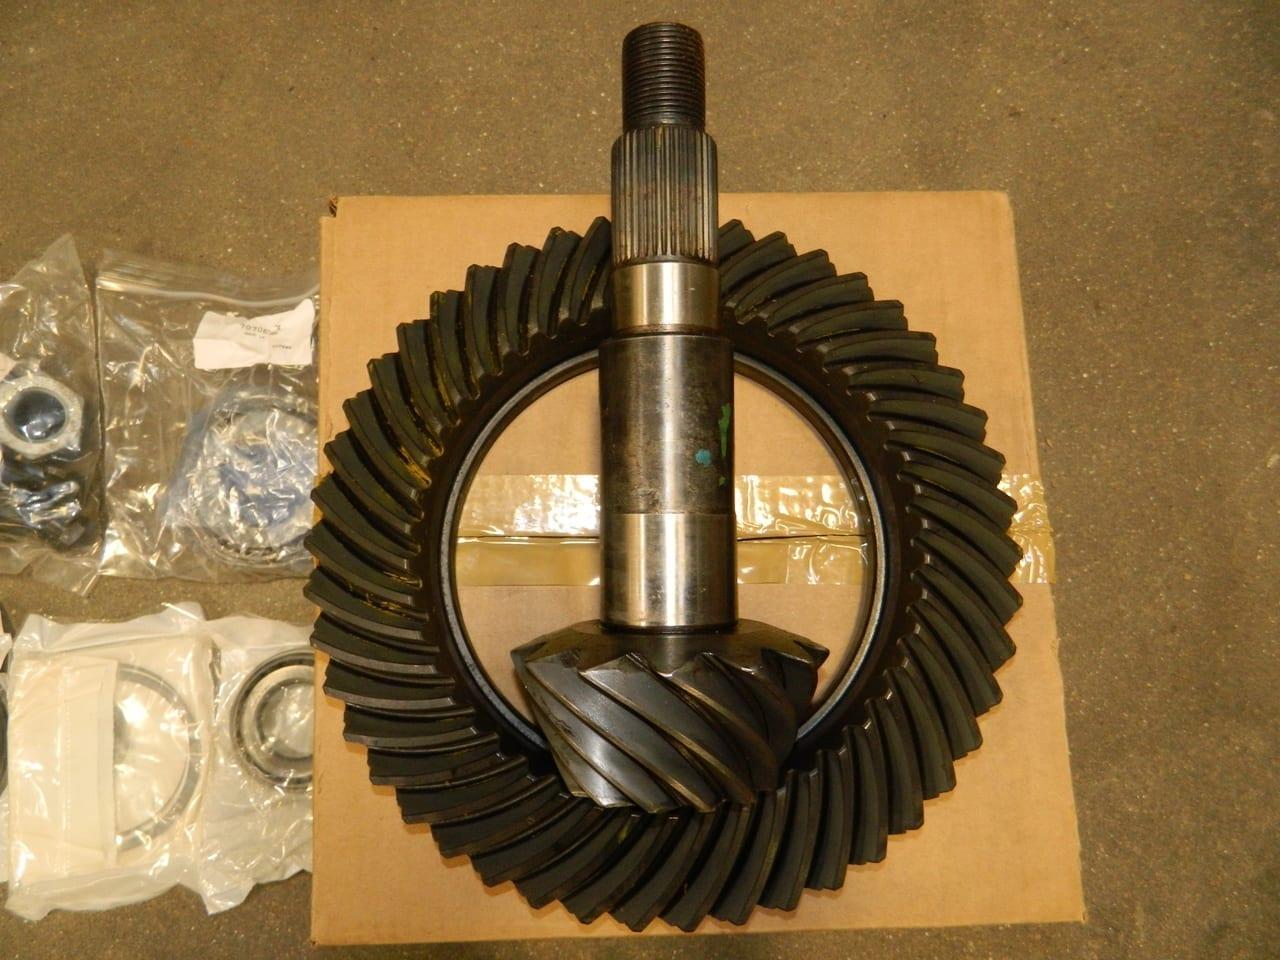 Dana 80 Dodge 3:54 Ring Gear & Pinion Kit with Shims Pinion Bearings 2001 1/2-2003